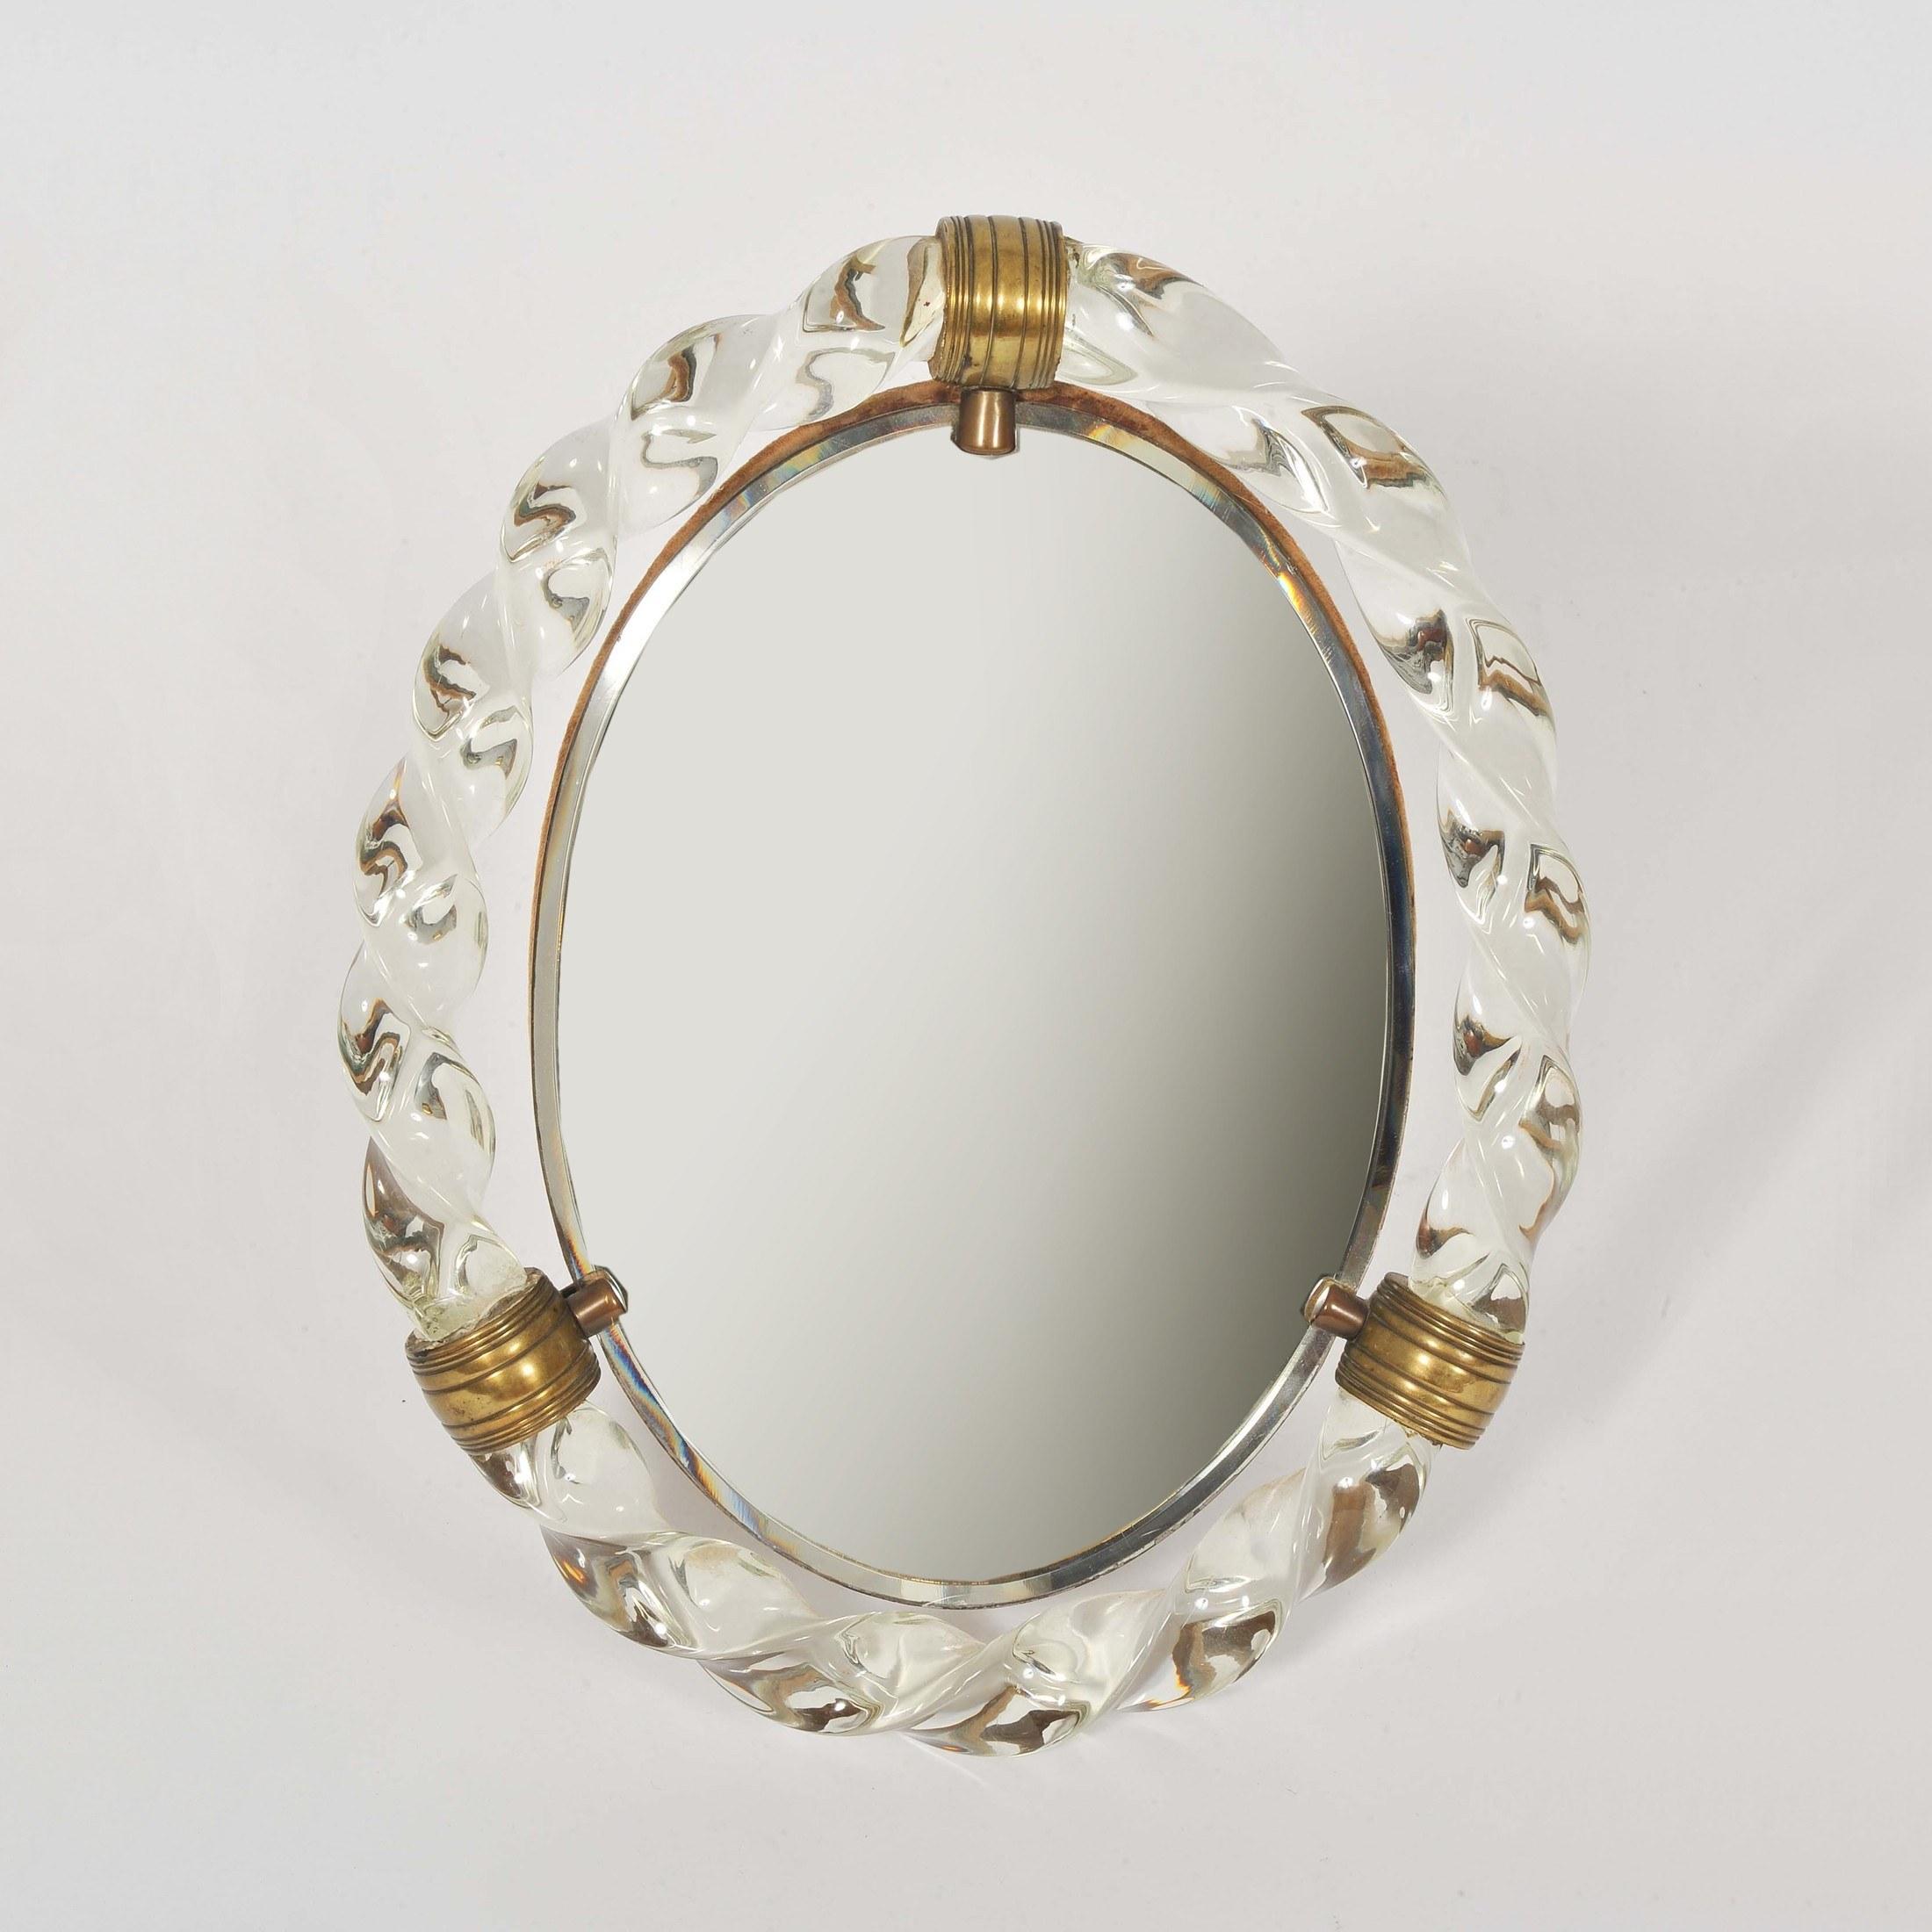 Valerie Wade Mt669 1950S Italian Oval Dressing Table Mirror 01